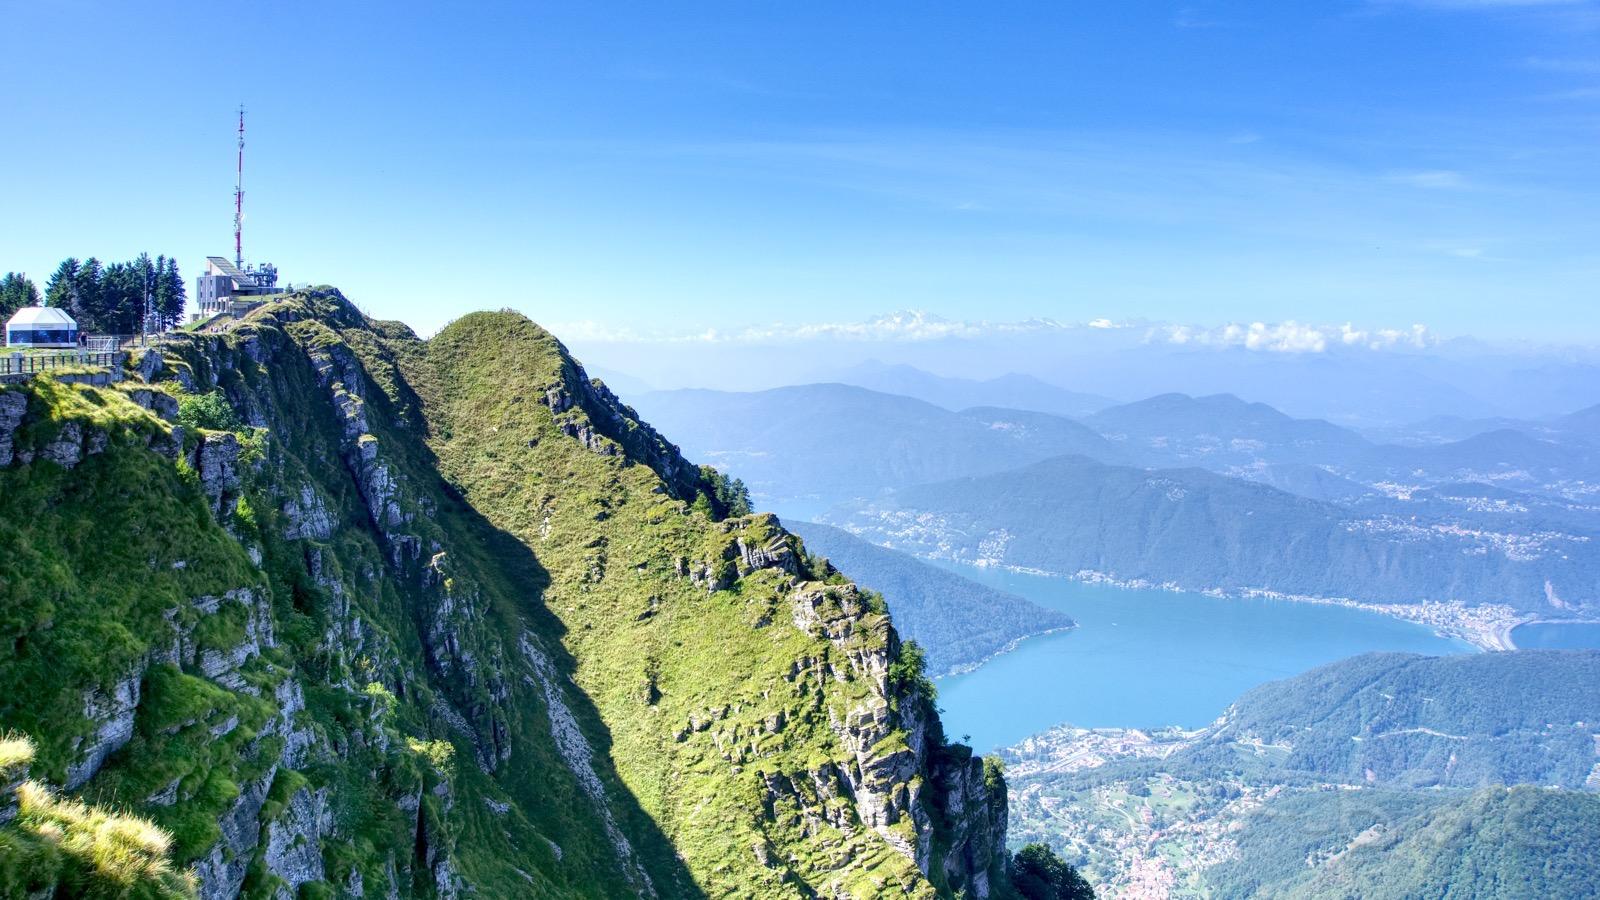 Grandioser Ausblick am Monte Generoso.